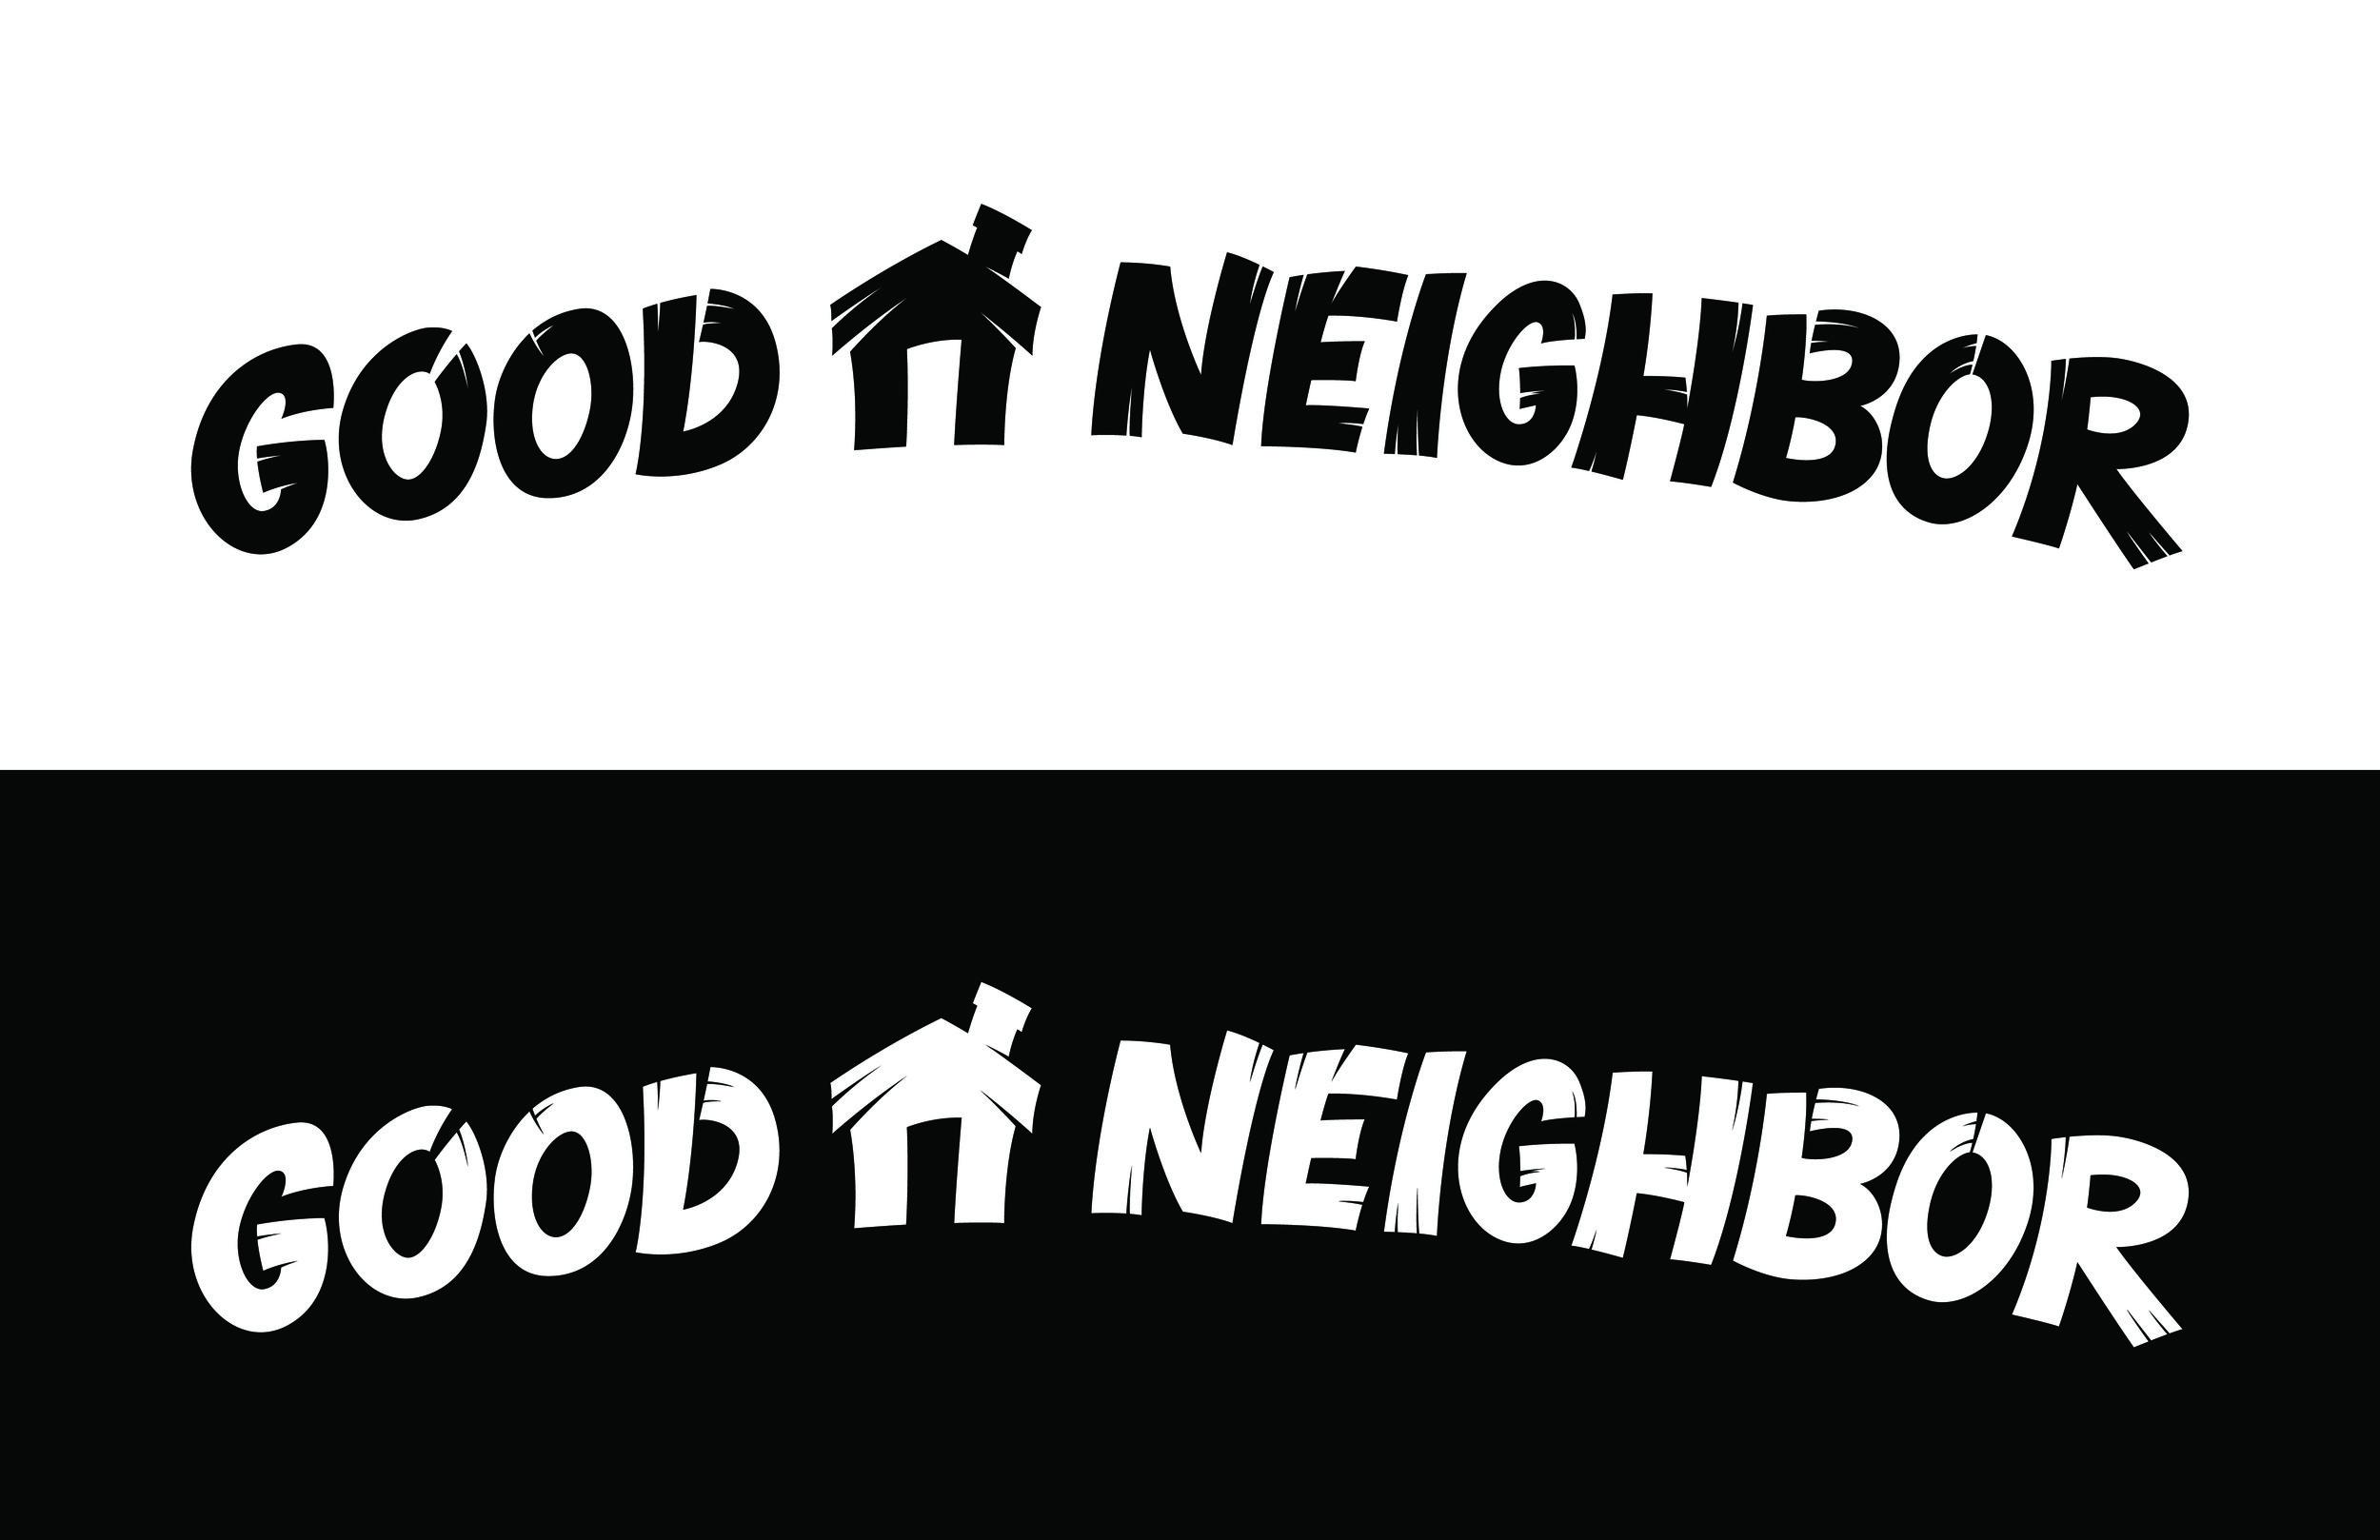 GoodNeighbor_House-07.JPG